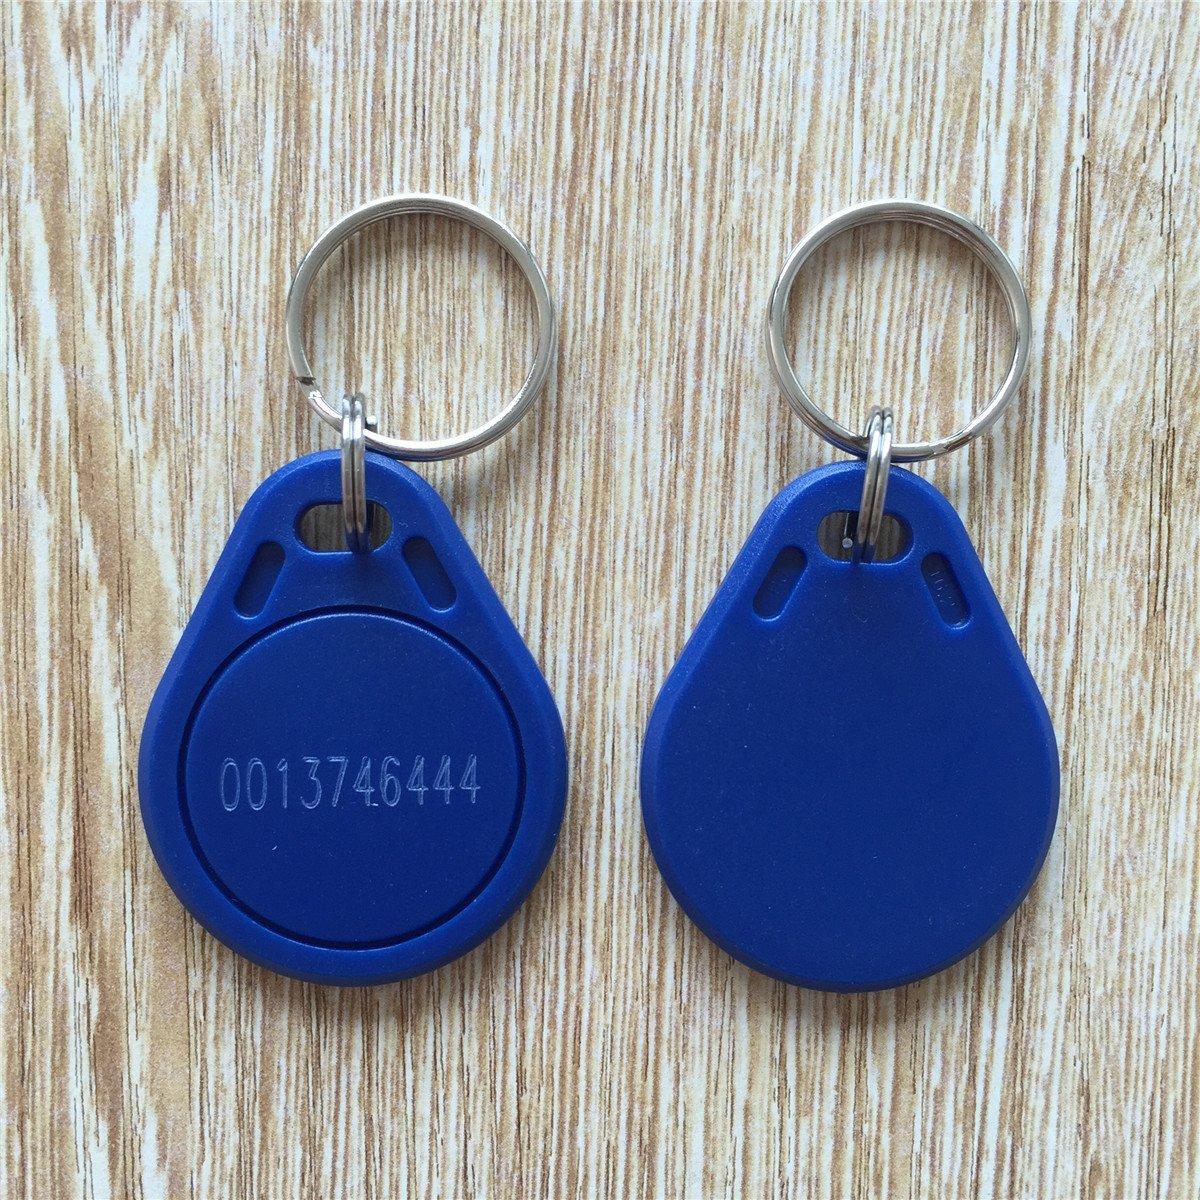 купить RFID Tag Blue EM4100 125khz EM Marine Keyfob (pack of 100) (Model 2) дешево